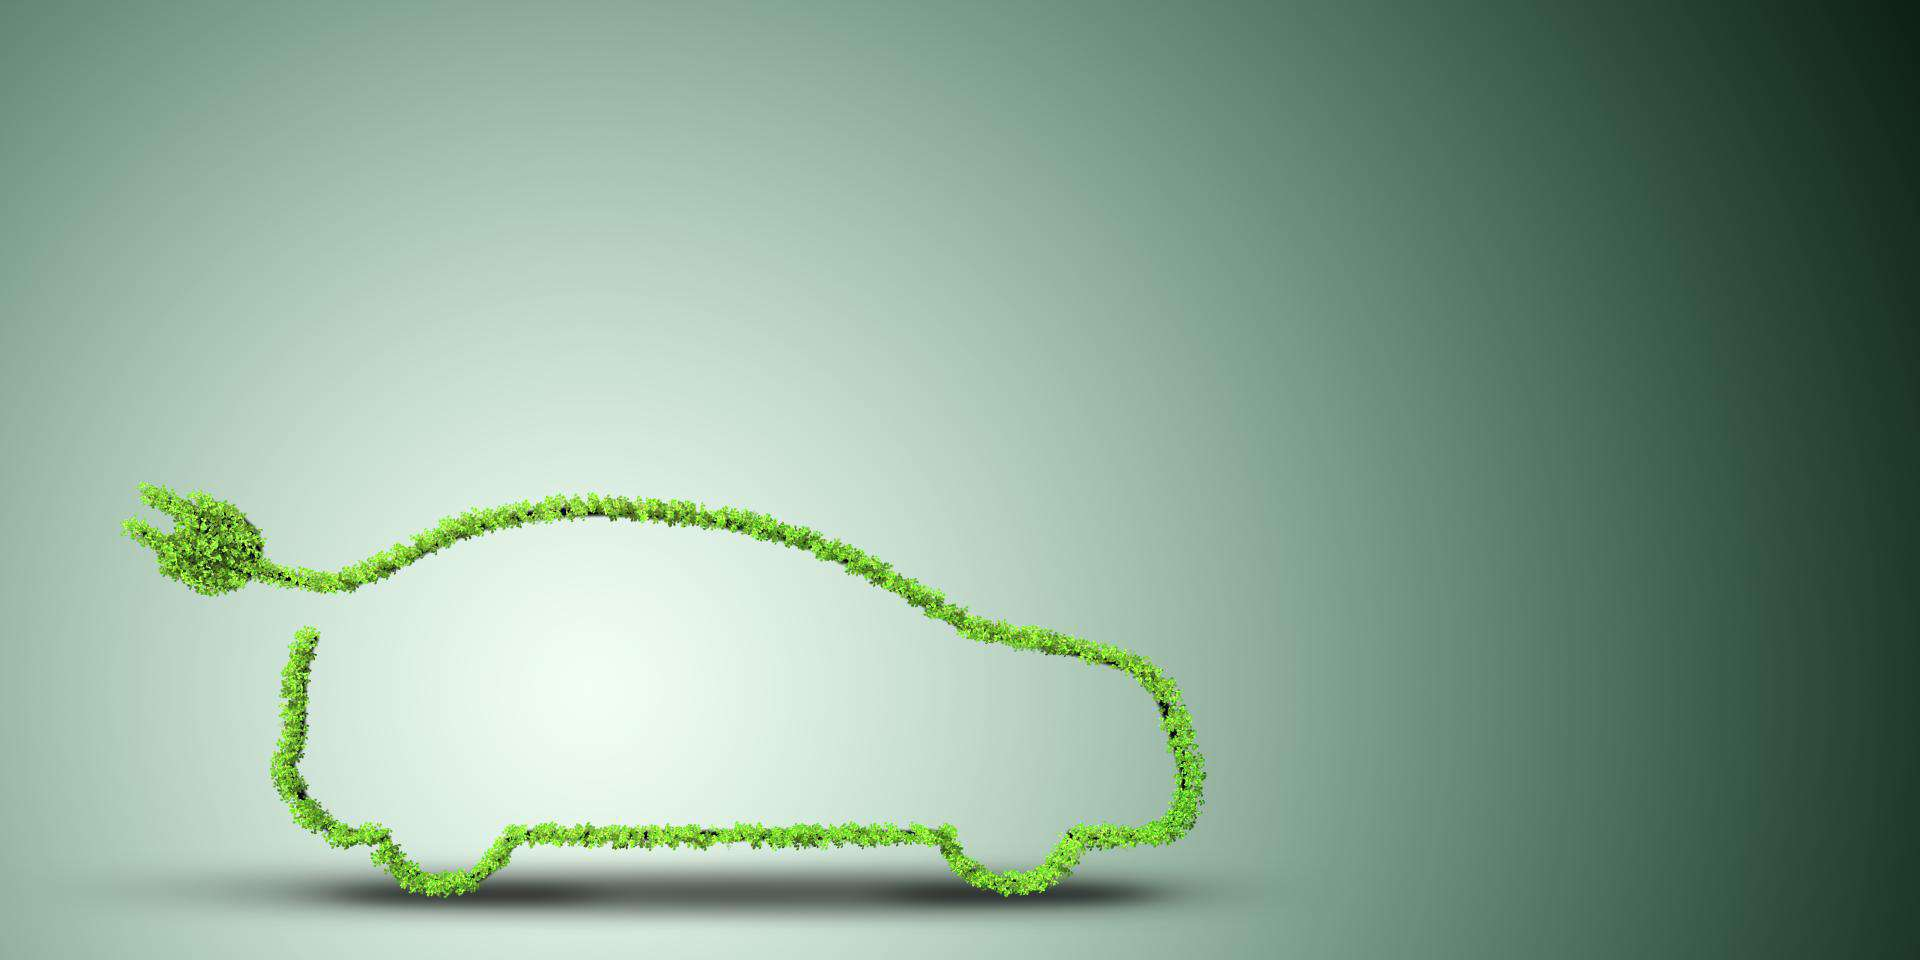 Europas Elektroauto-Markt rast an China vorbei - ohne Tesla-Rückenwind